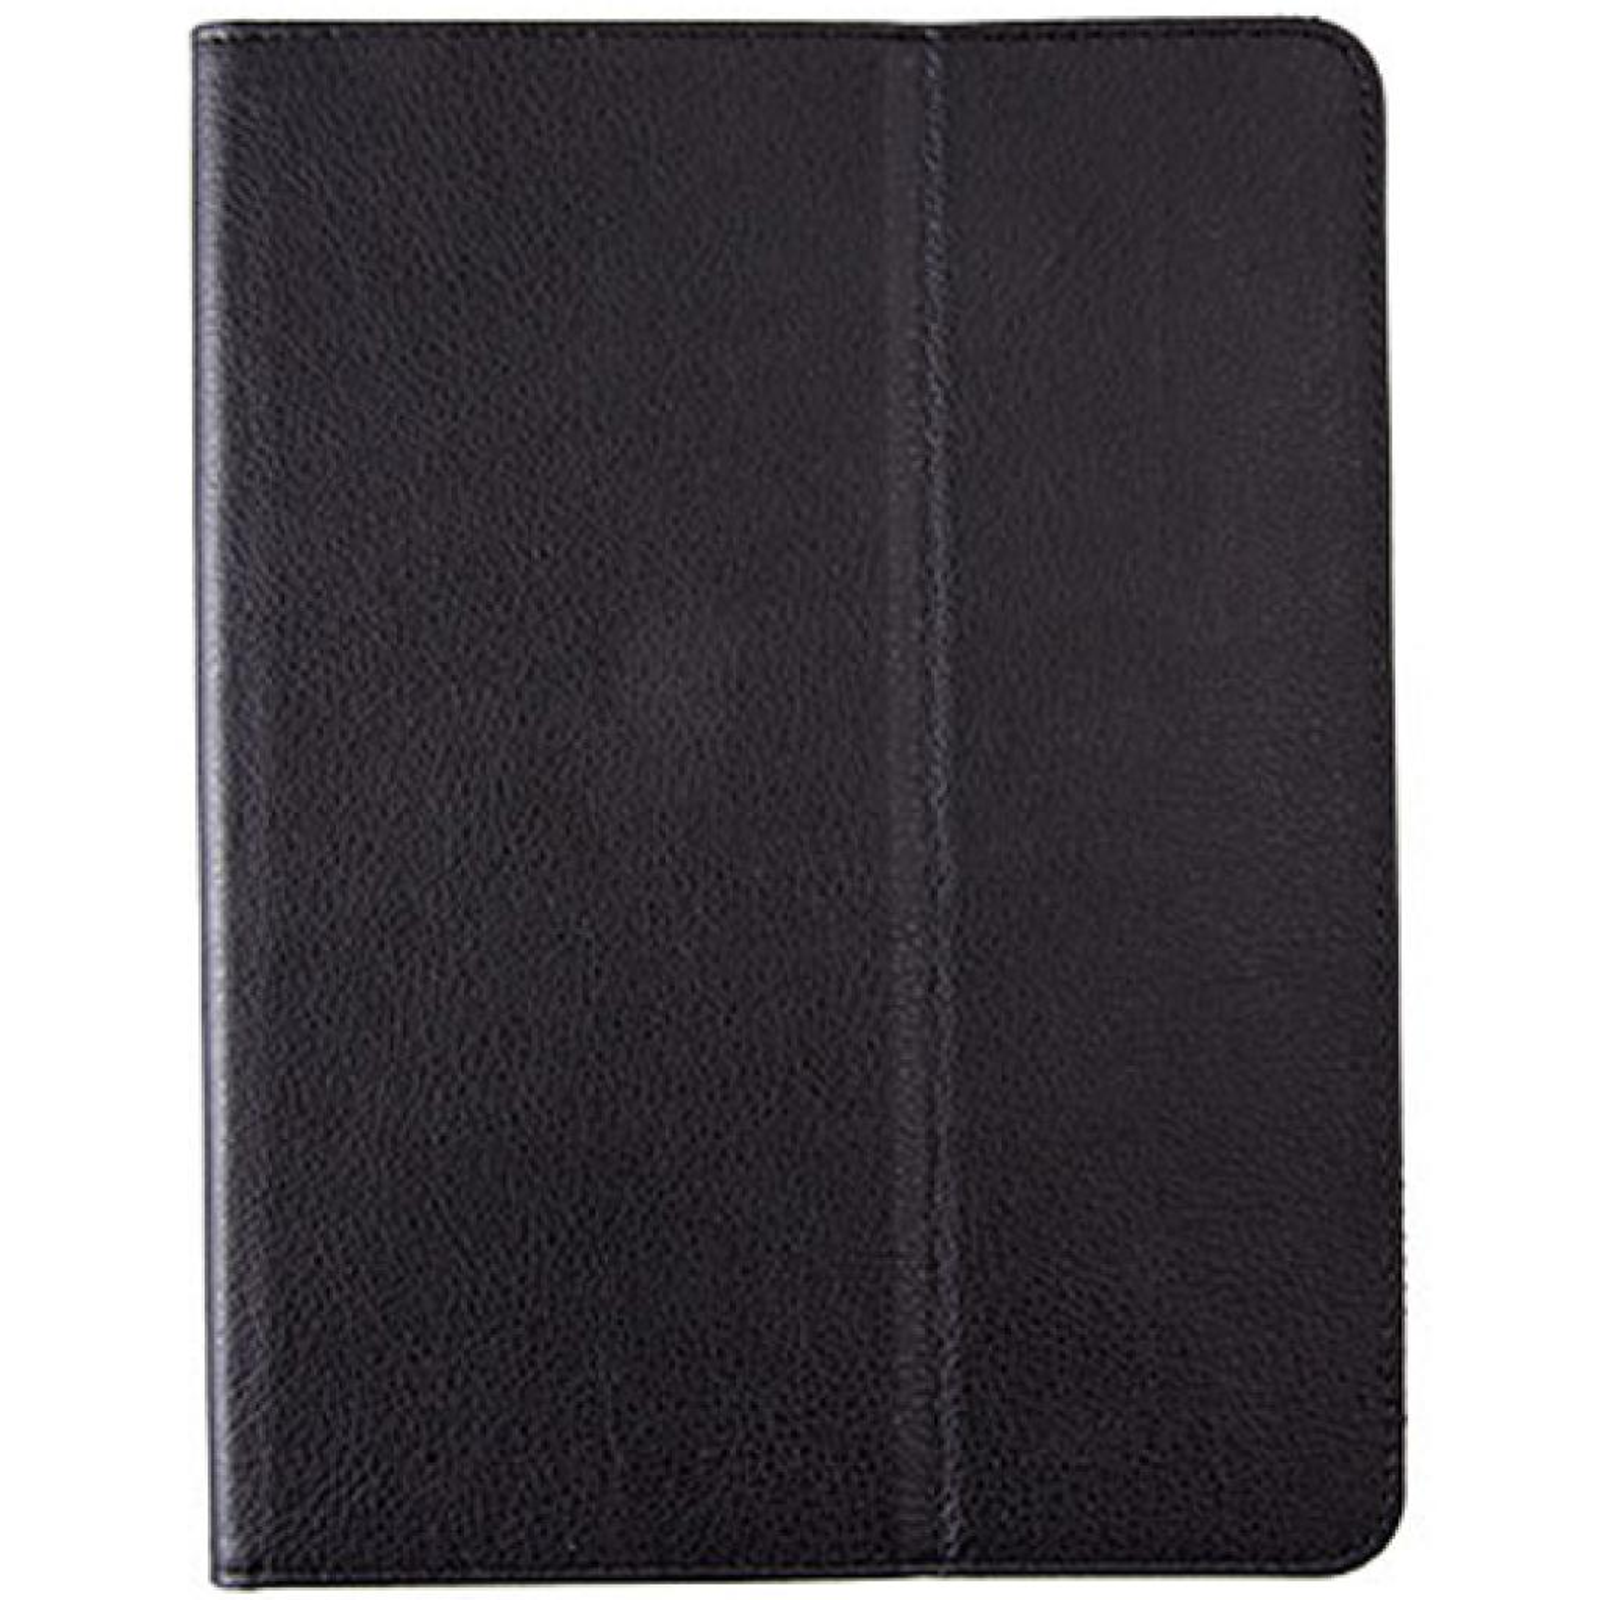 "Чехол для планшета Drobak 8"" Universal stand Black (216874)"